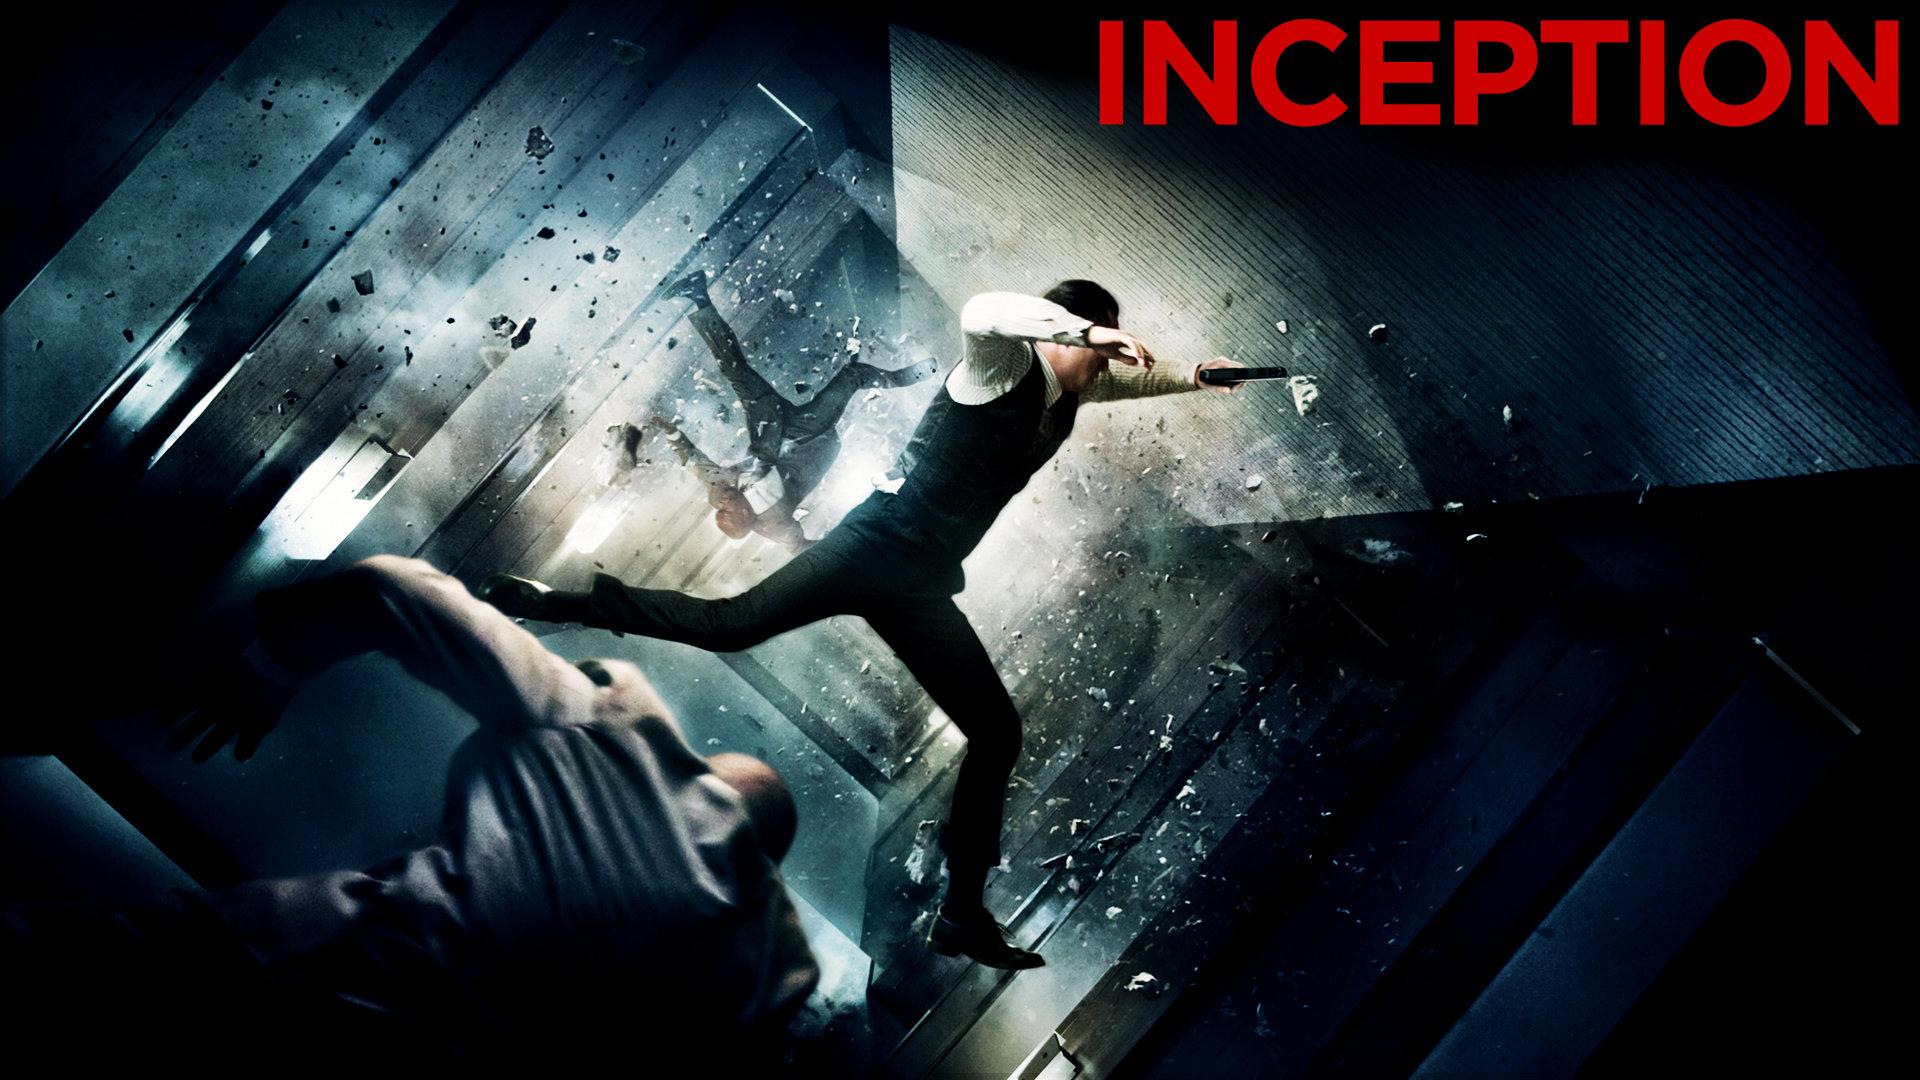 inception movie free download